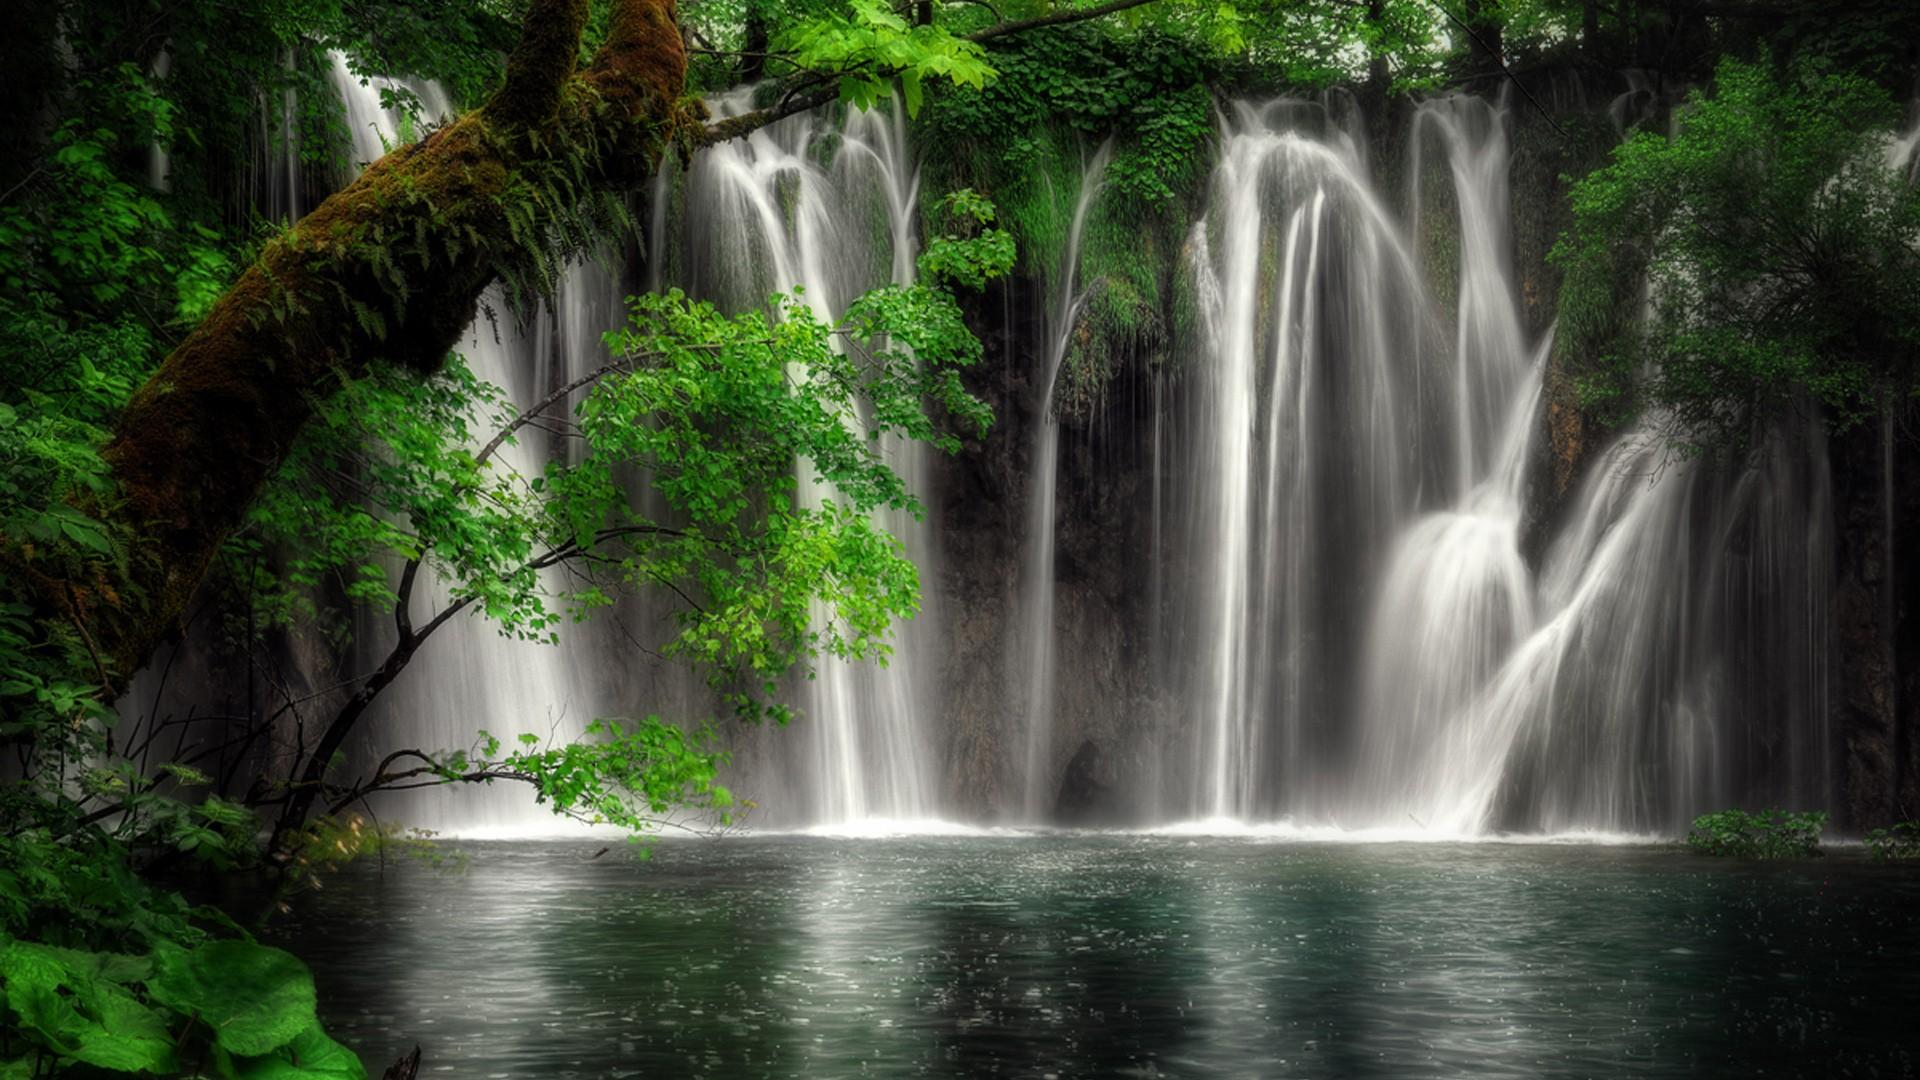 Waterfall wallpaper background